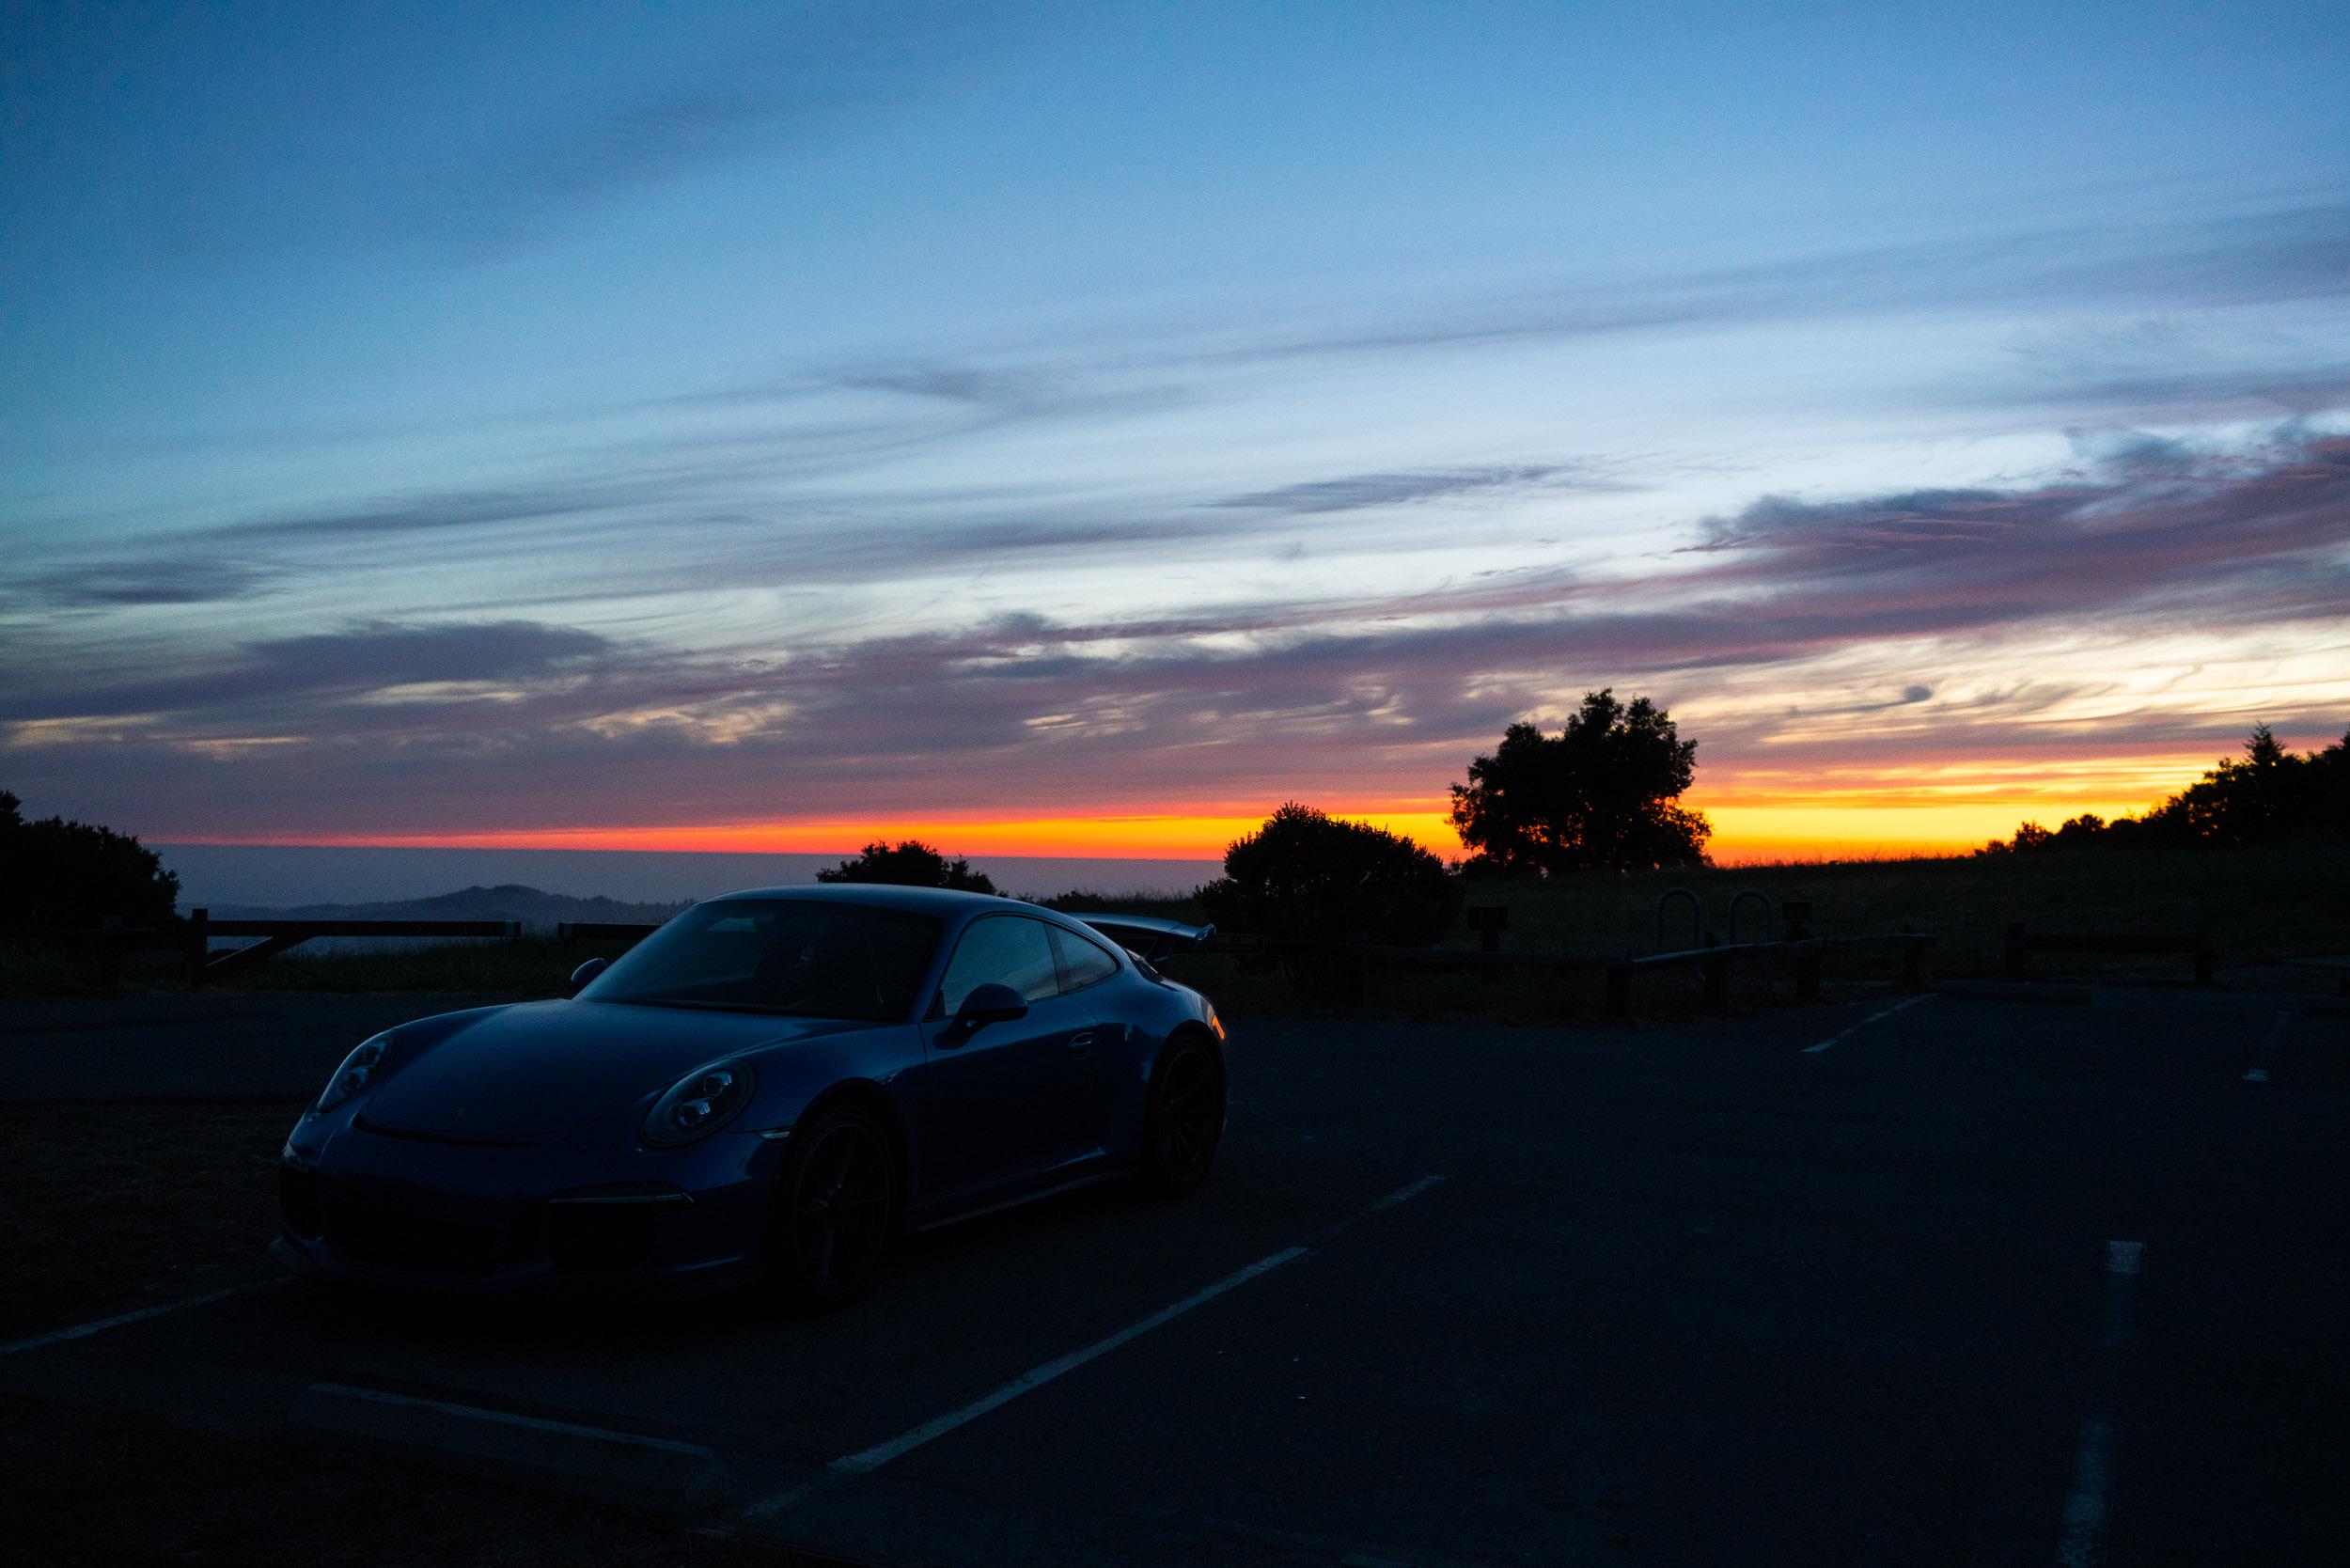 porsche-911-gt3-sunset-audrey-c-rust-commemorative-site-parking.jpg